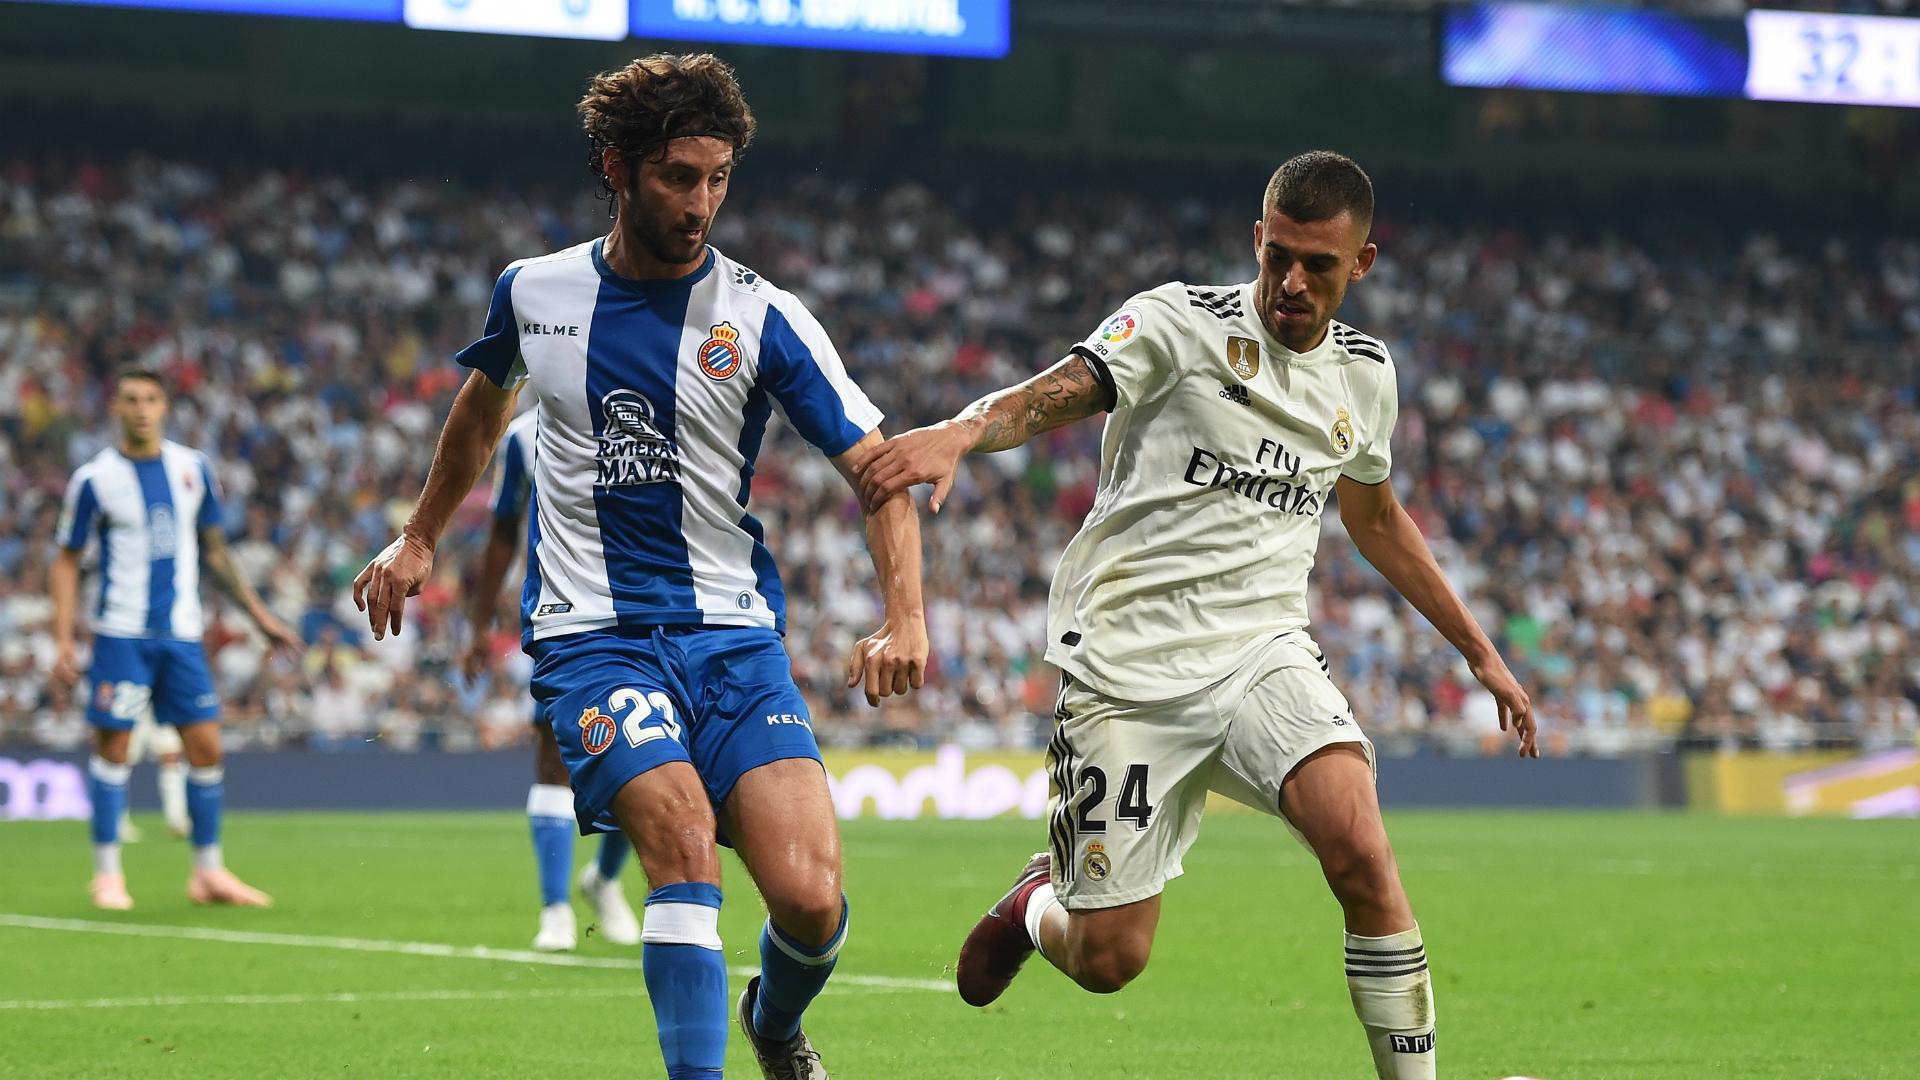 Espanyol v barcelona betting tips kleinbettingen moulinex